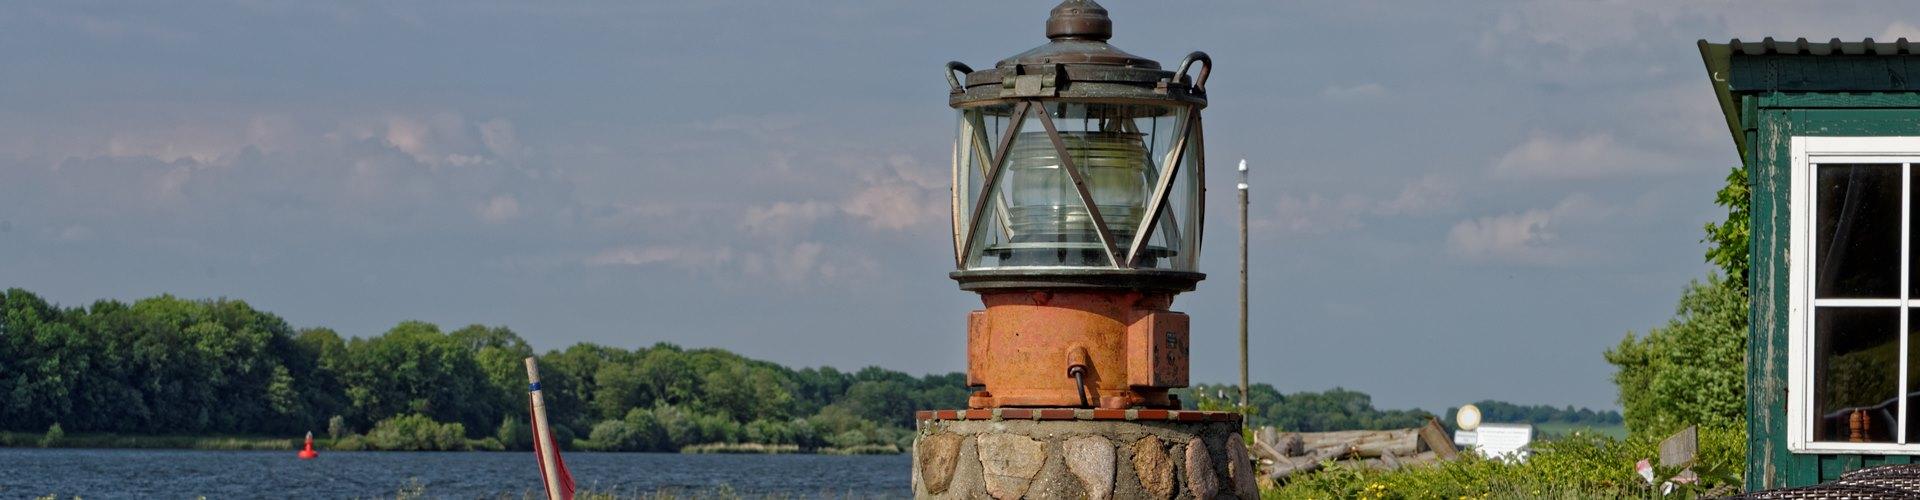 Gallowayzucht Seehusen Datenschutz